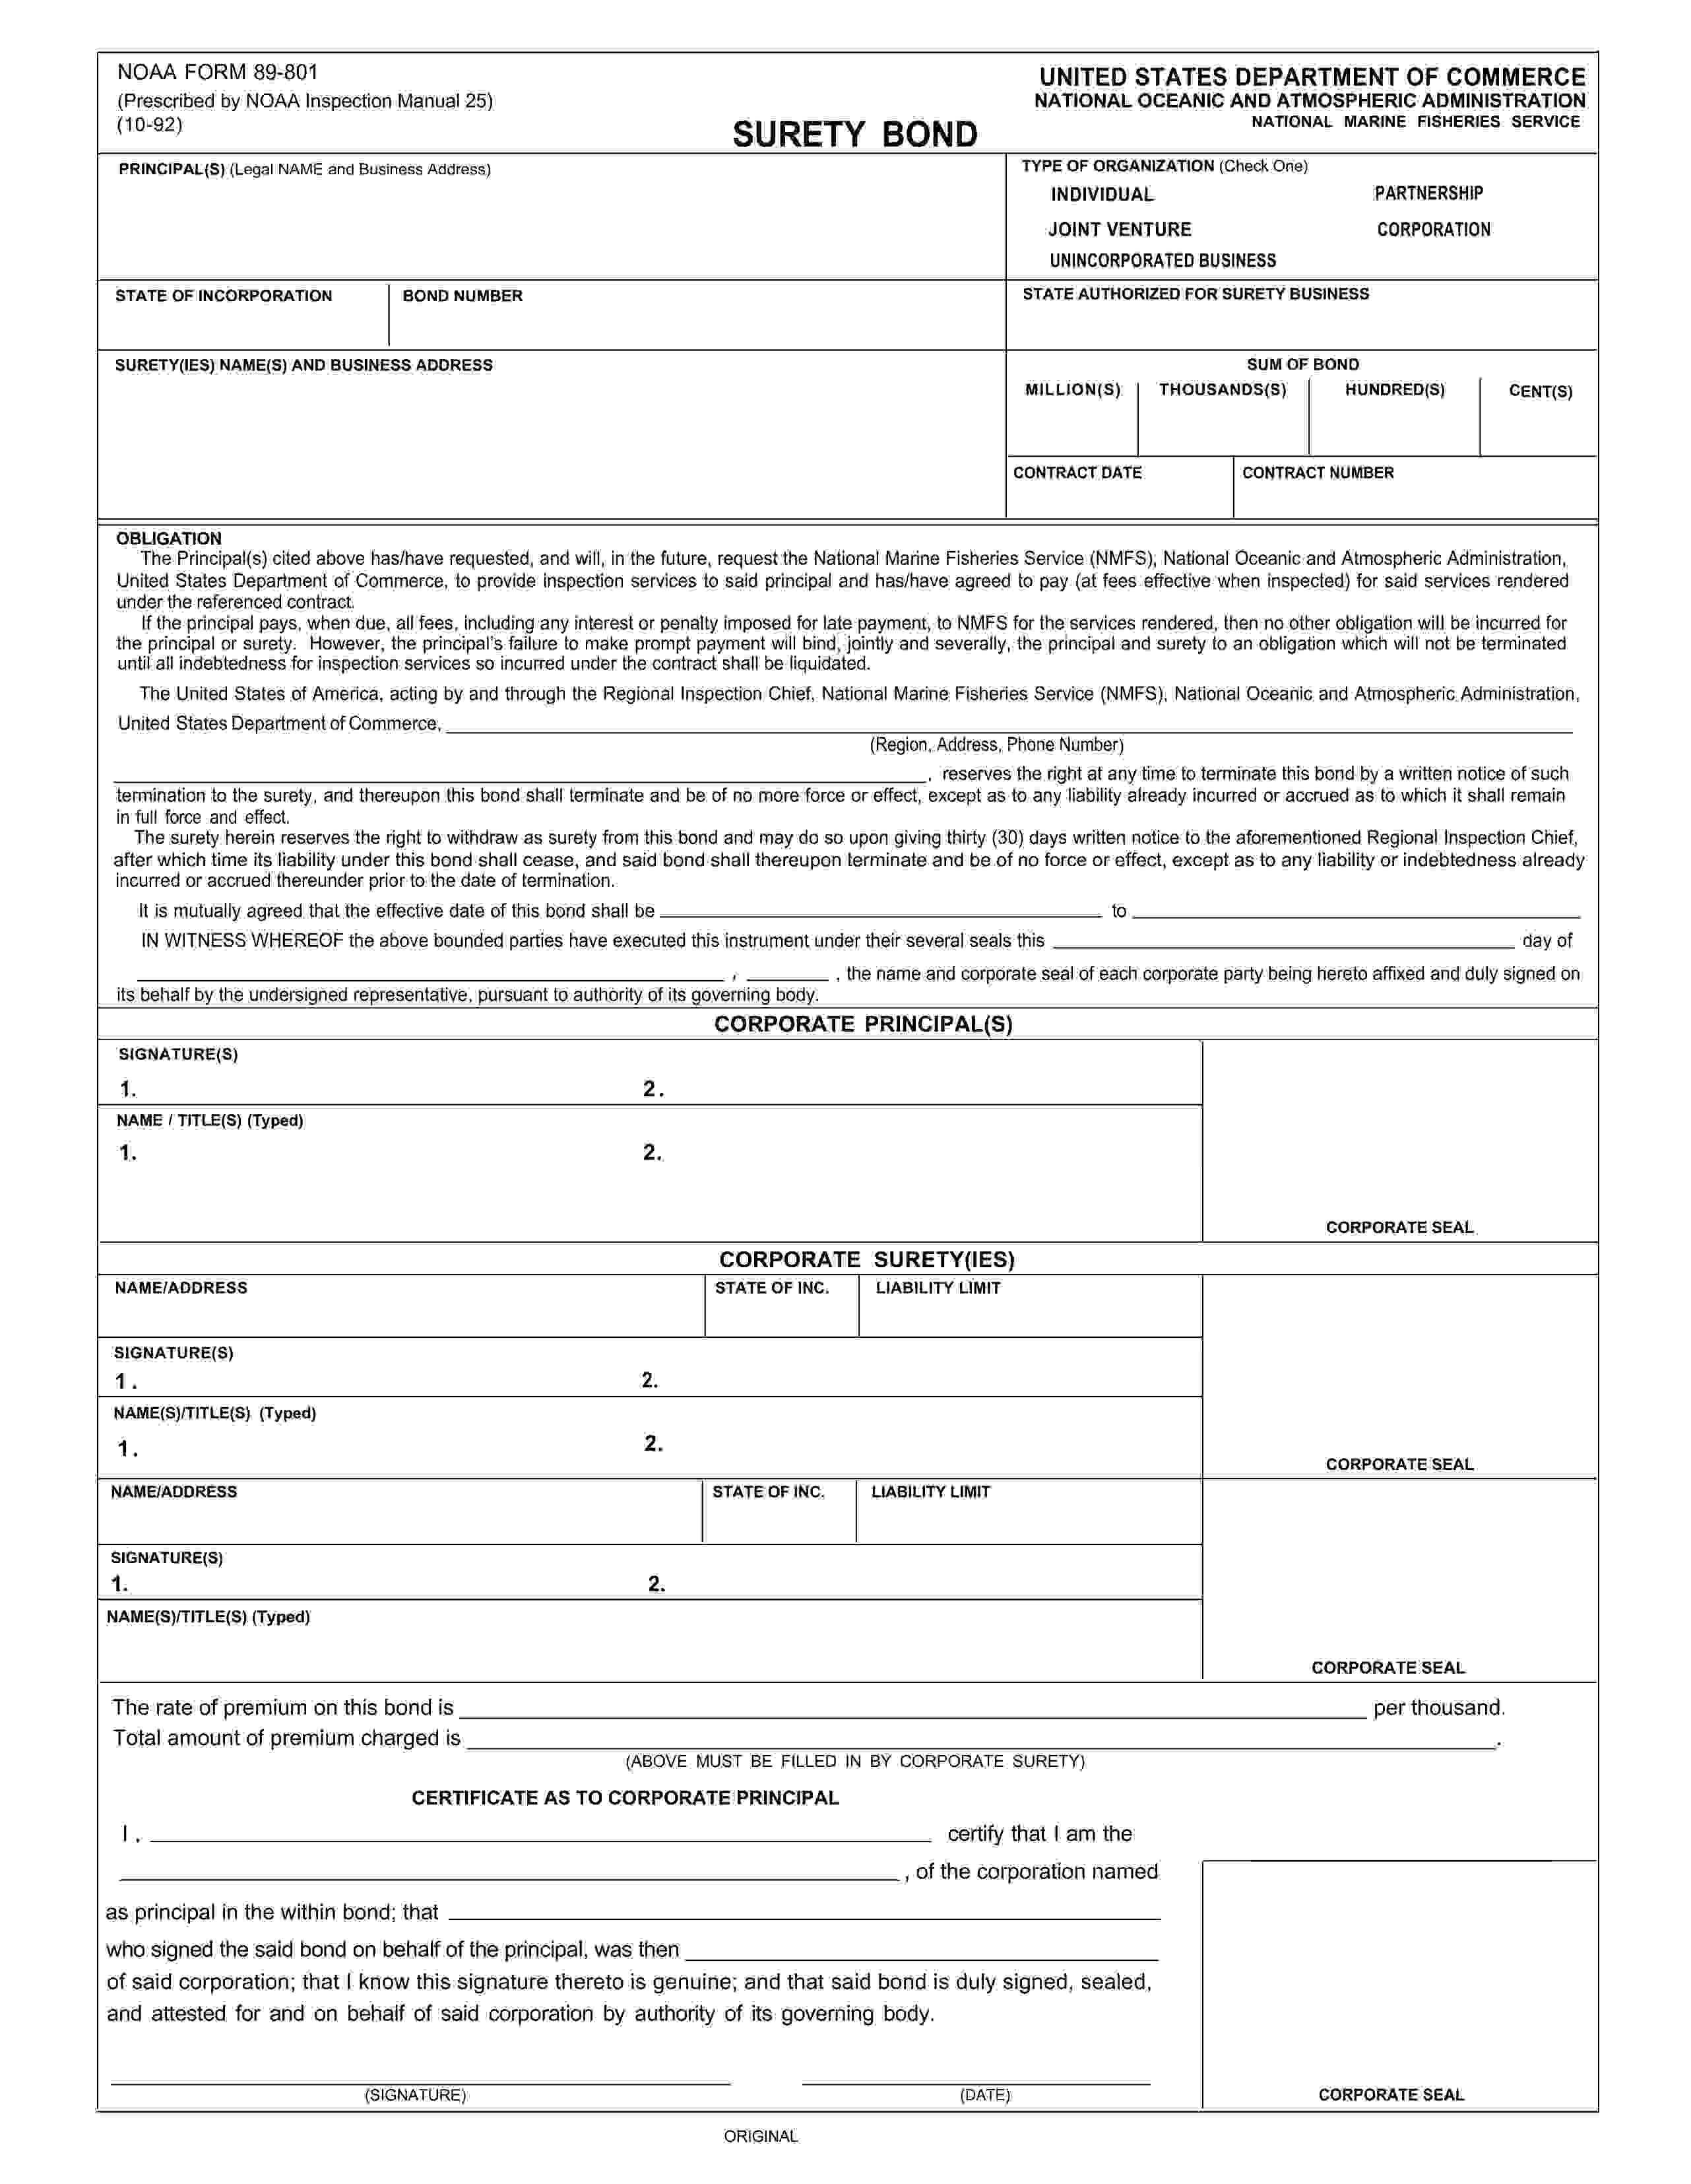 US Department of Commerce National Marine Fisheries Inspection Bond sample image